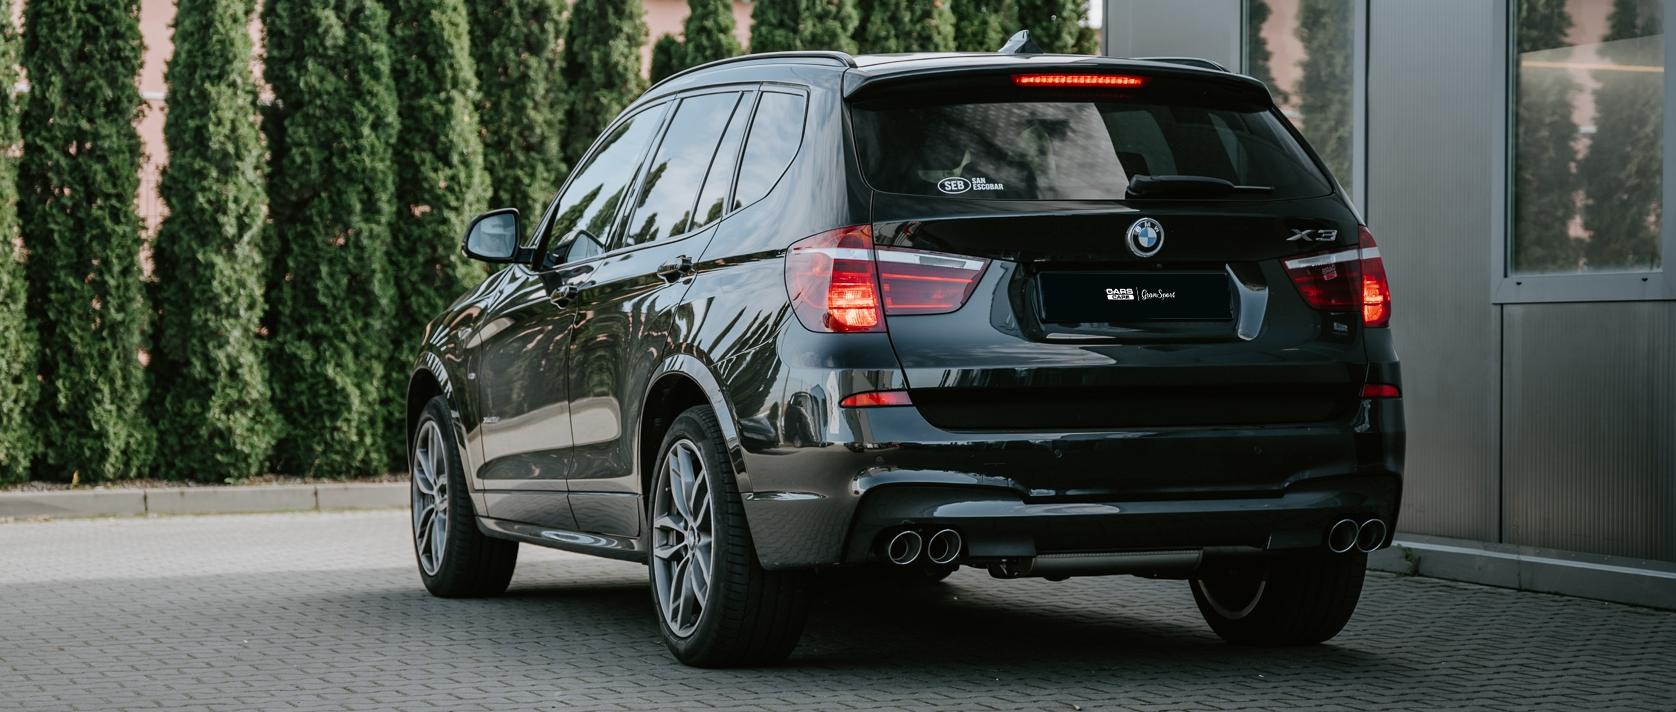 BMW X3 F25 Remus